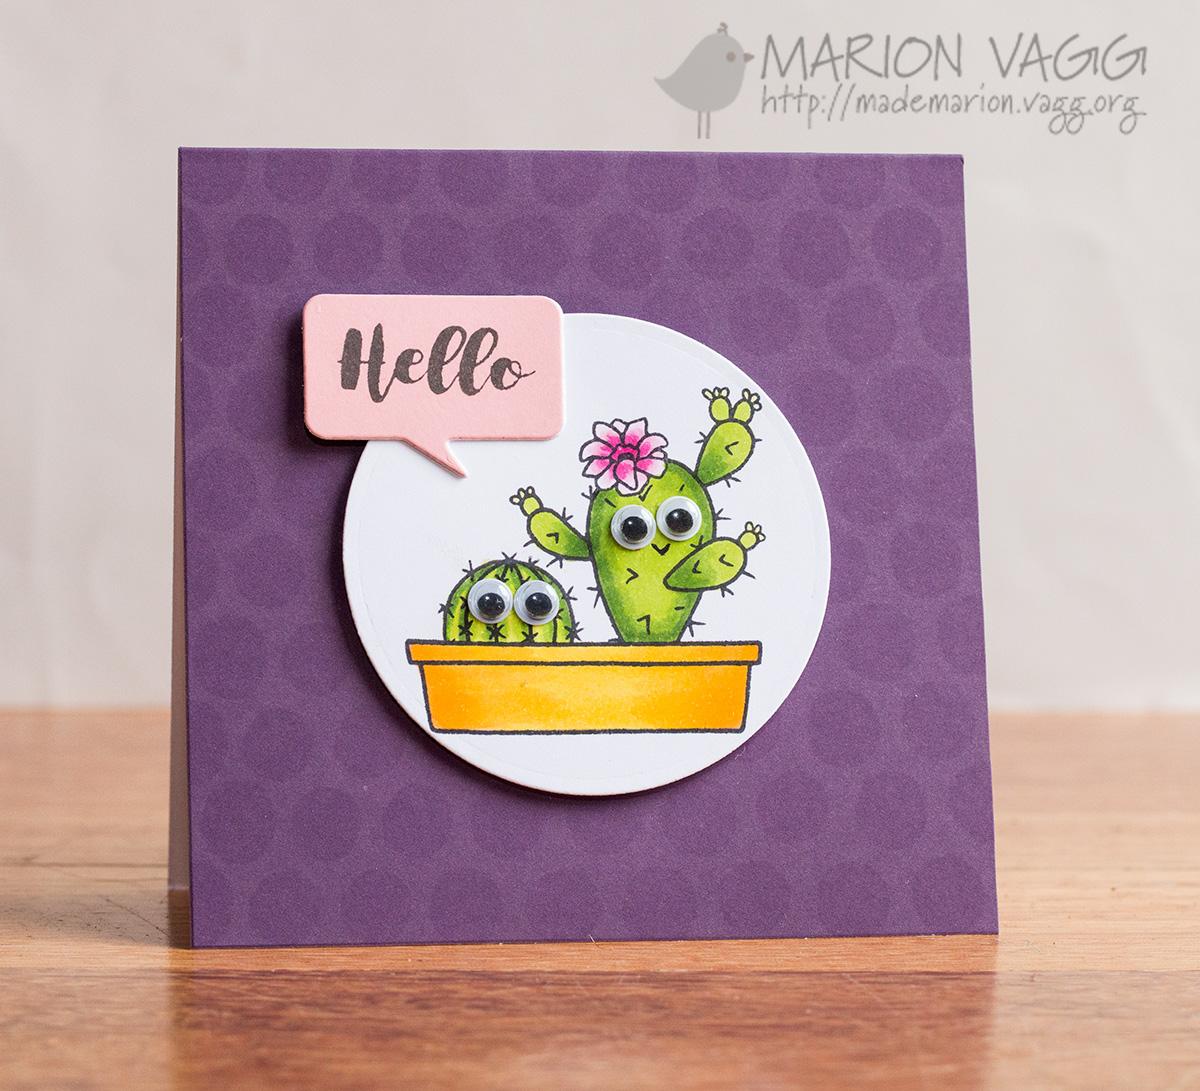 Hello - Jane's Doodles | Marion Vagg